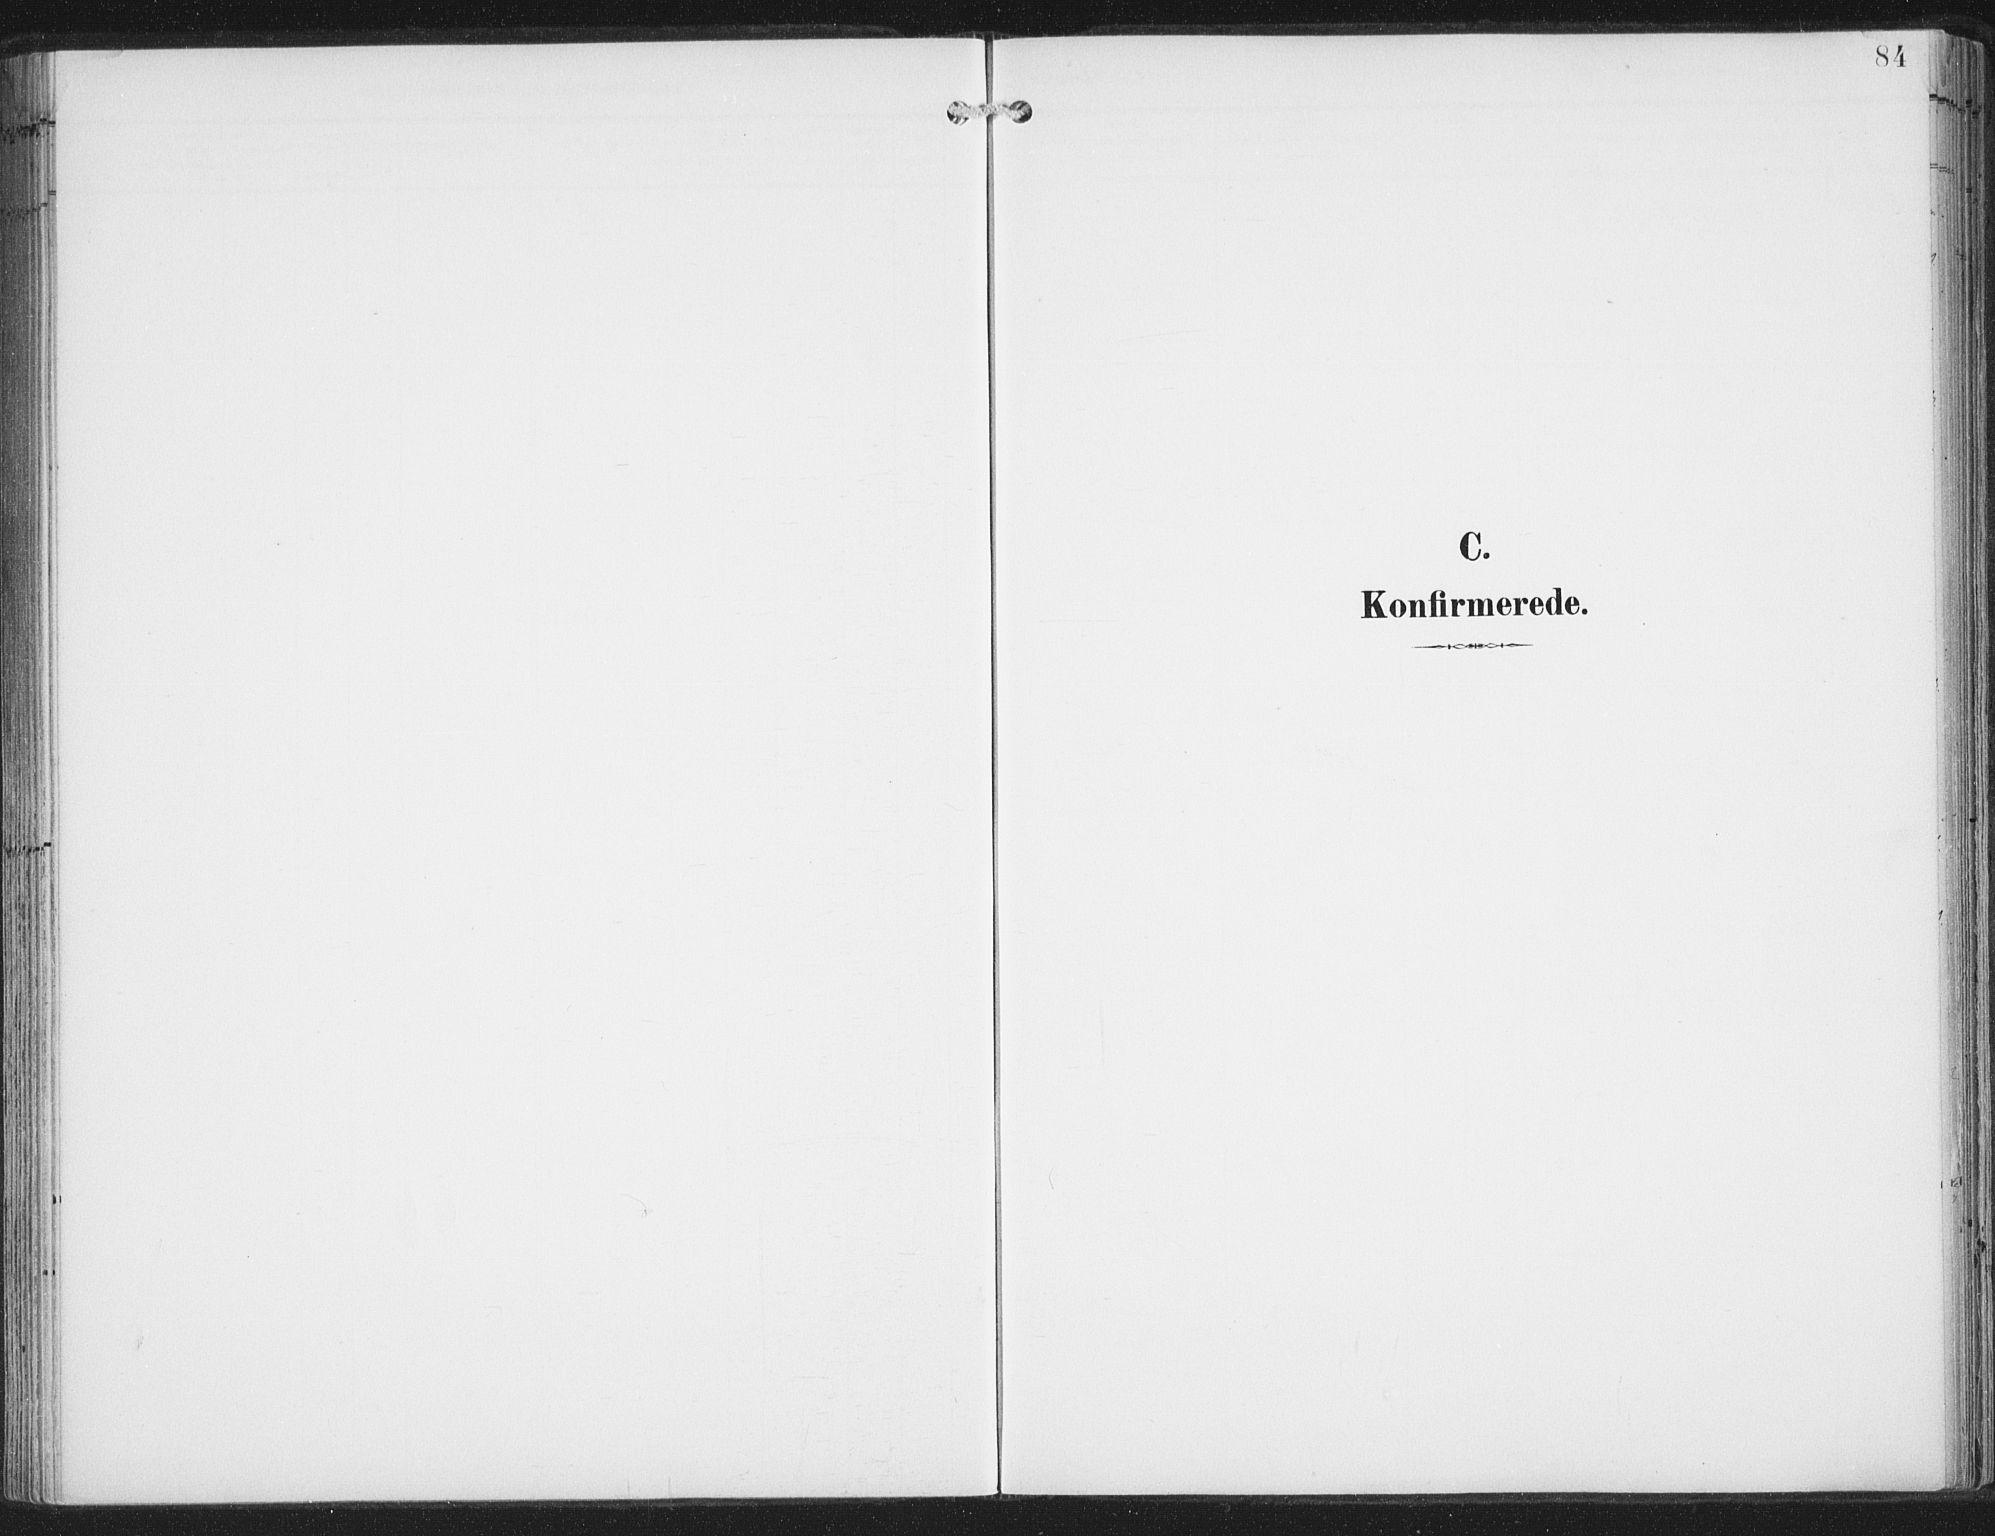 SATØ, Lenvik sokneprestembete, H/Ha: Ministerialbok nr. 15, 1896-1915, s. 84